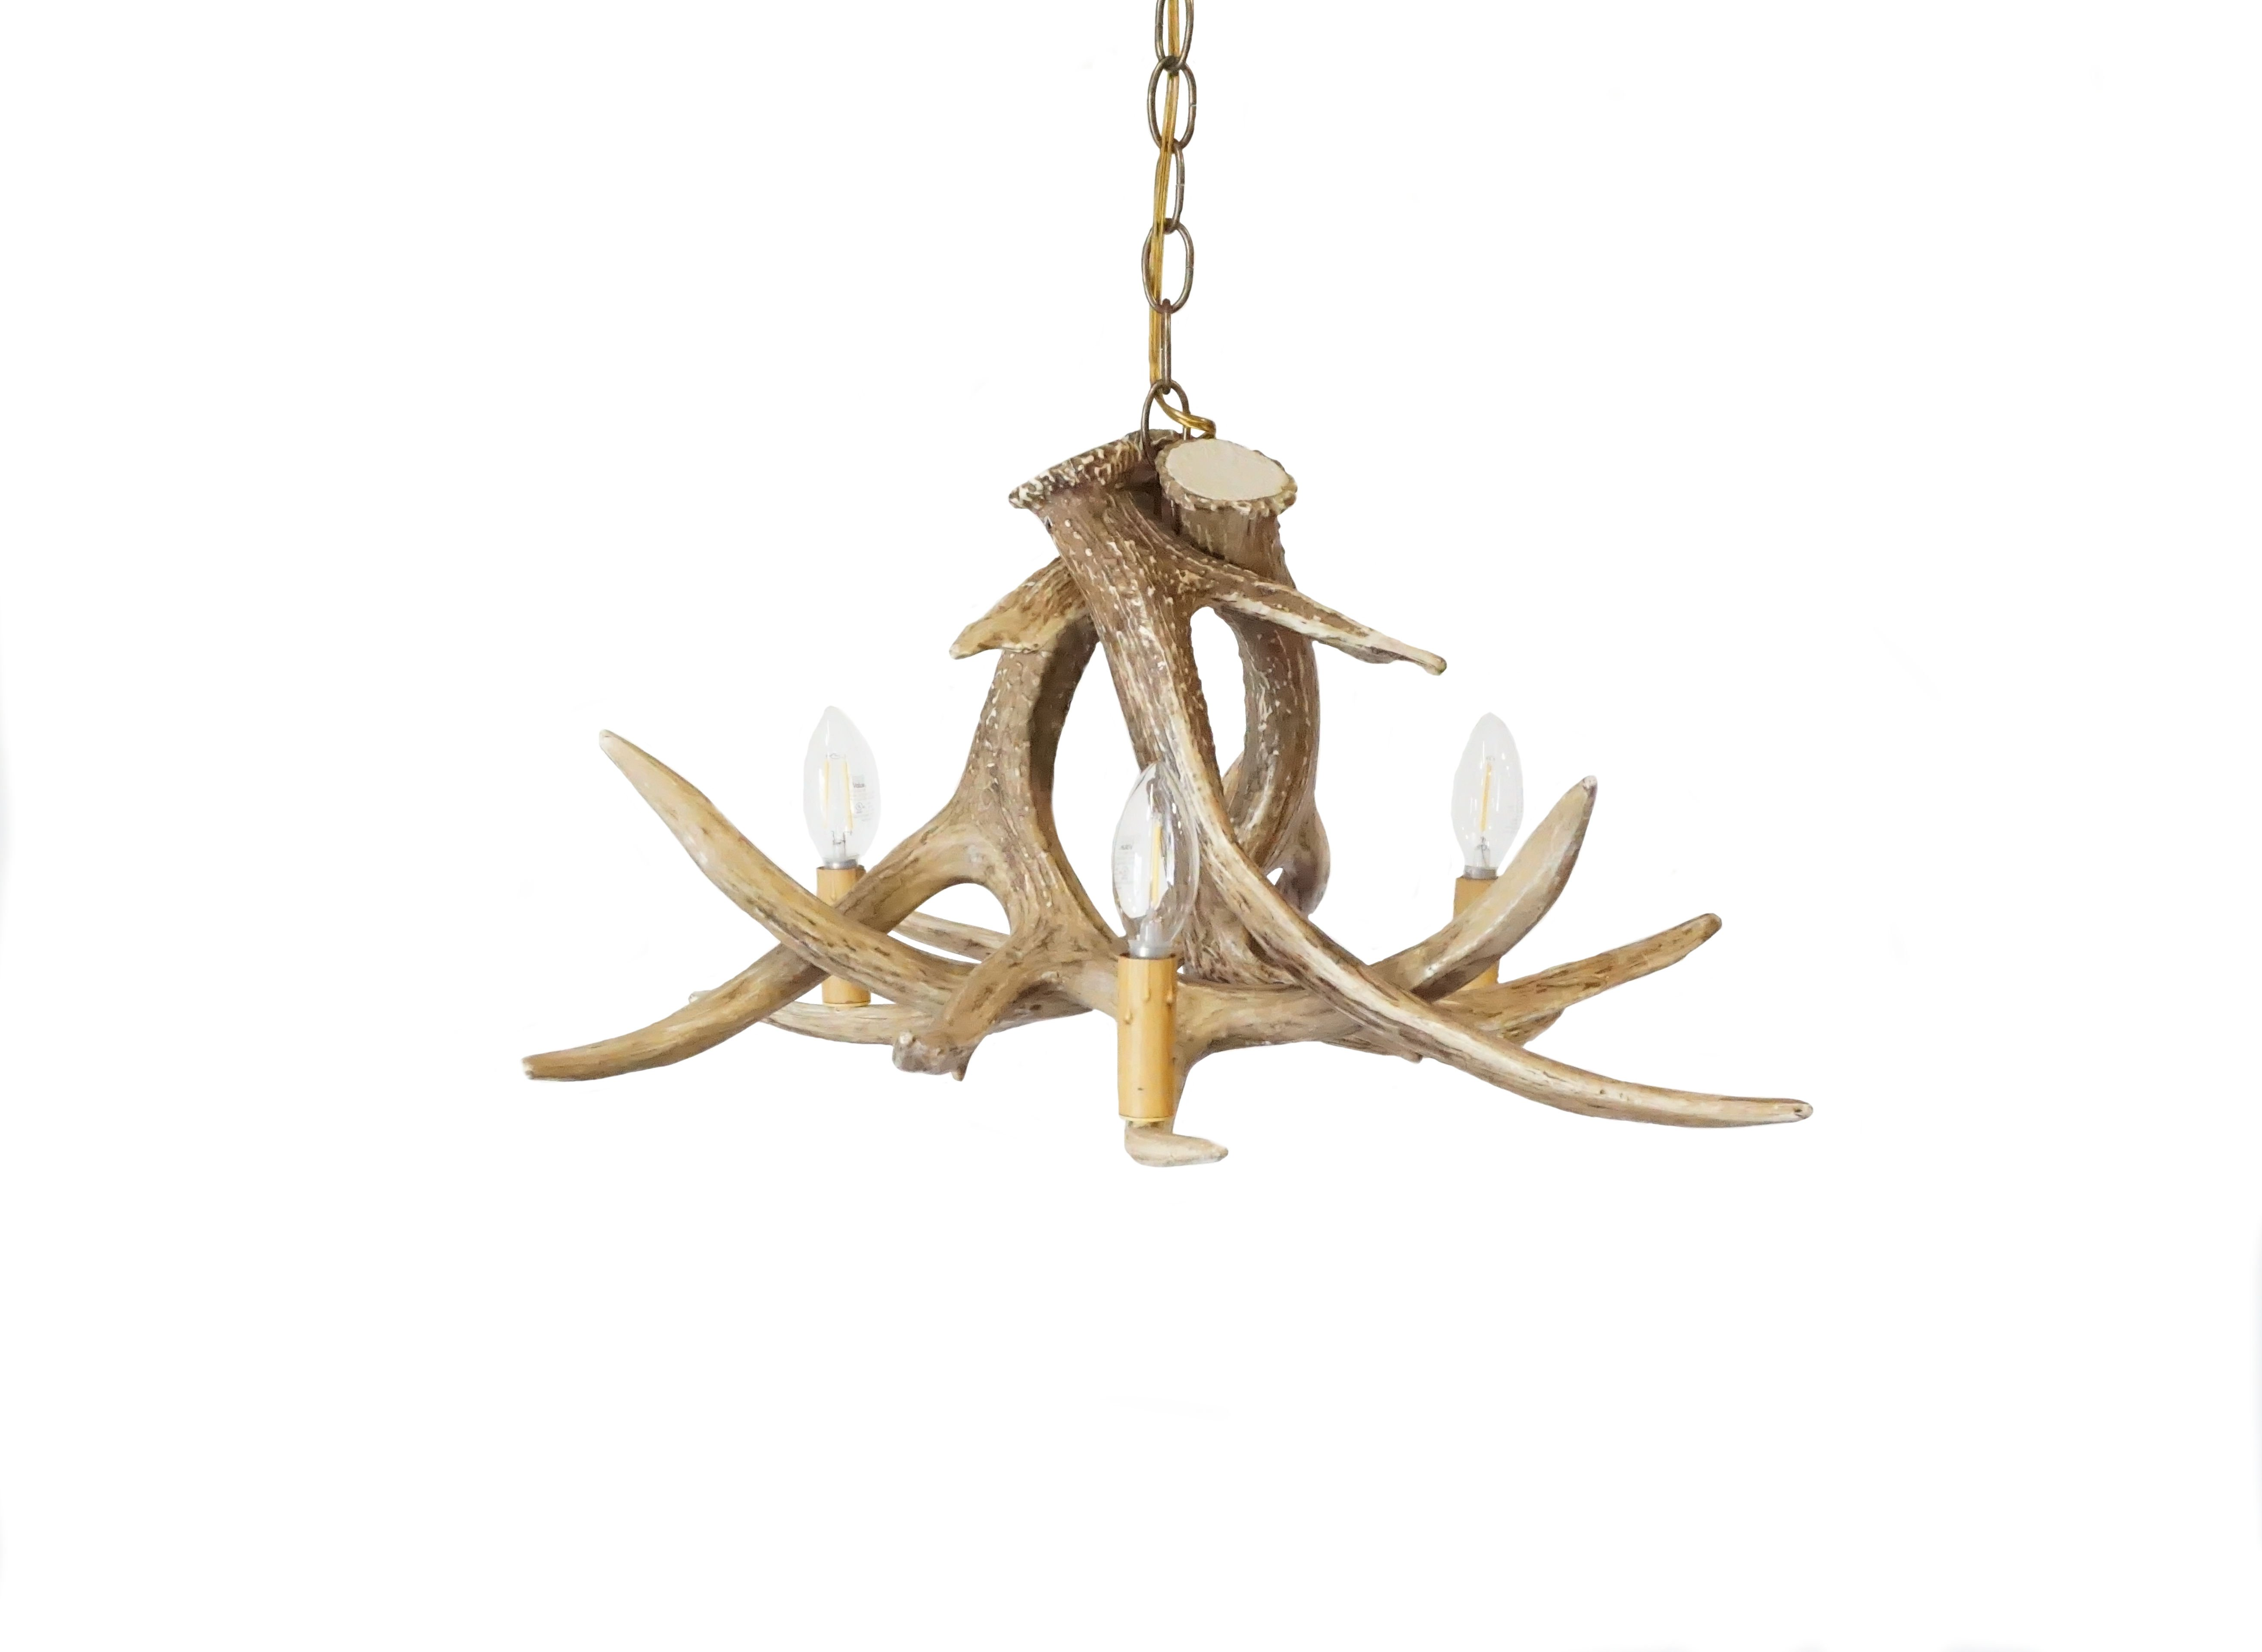 Whitetail Deer 3 Antler Chandelier Cast Horn Designs